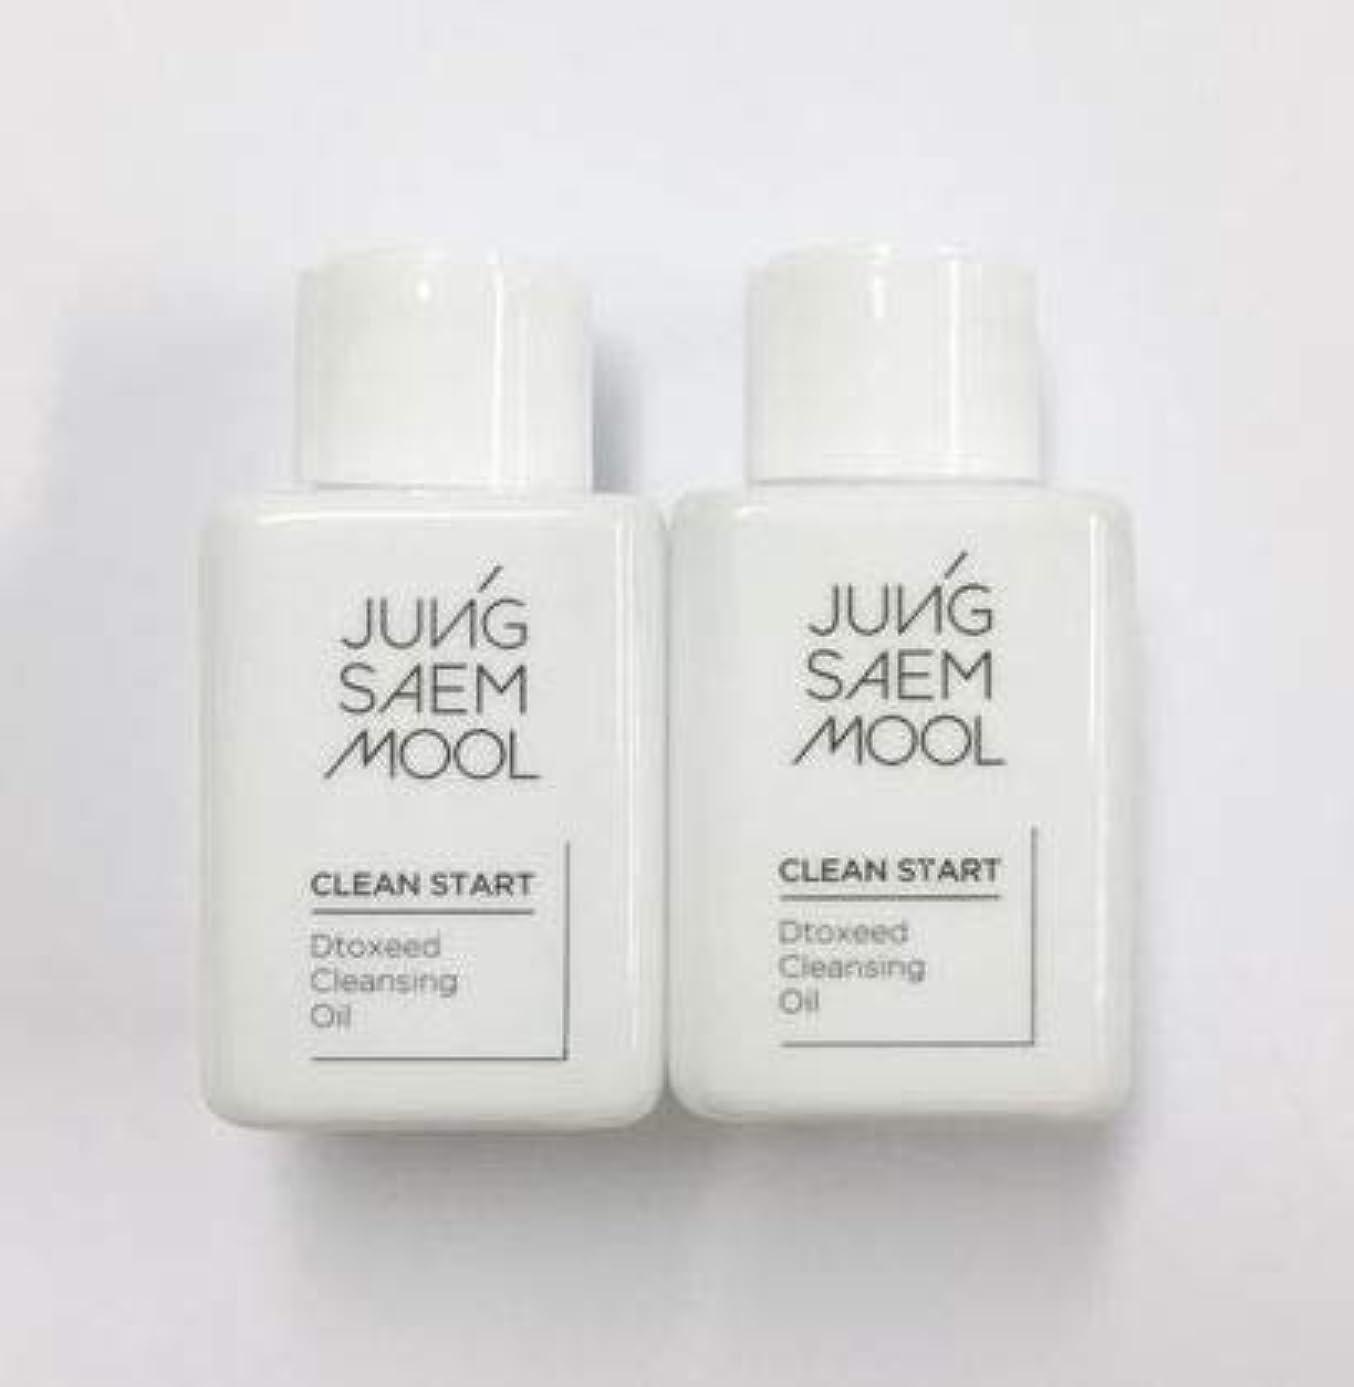 JUNG SAEM MOOL Clean Start Dtoxeed Cleansing Oil_サンプル (30ml)*2ea [並行輸入品]